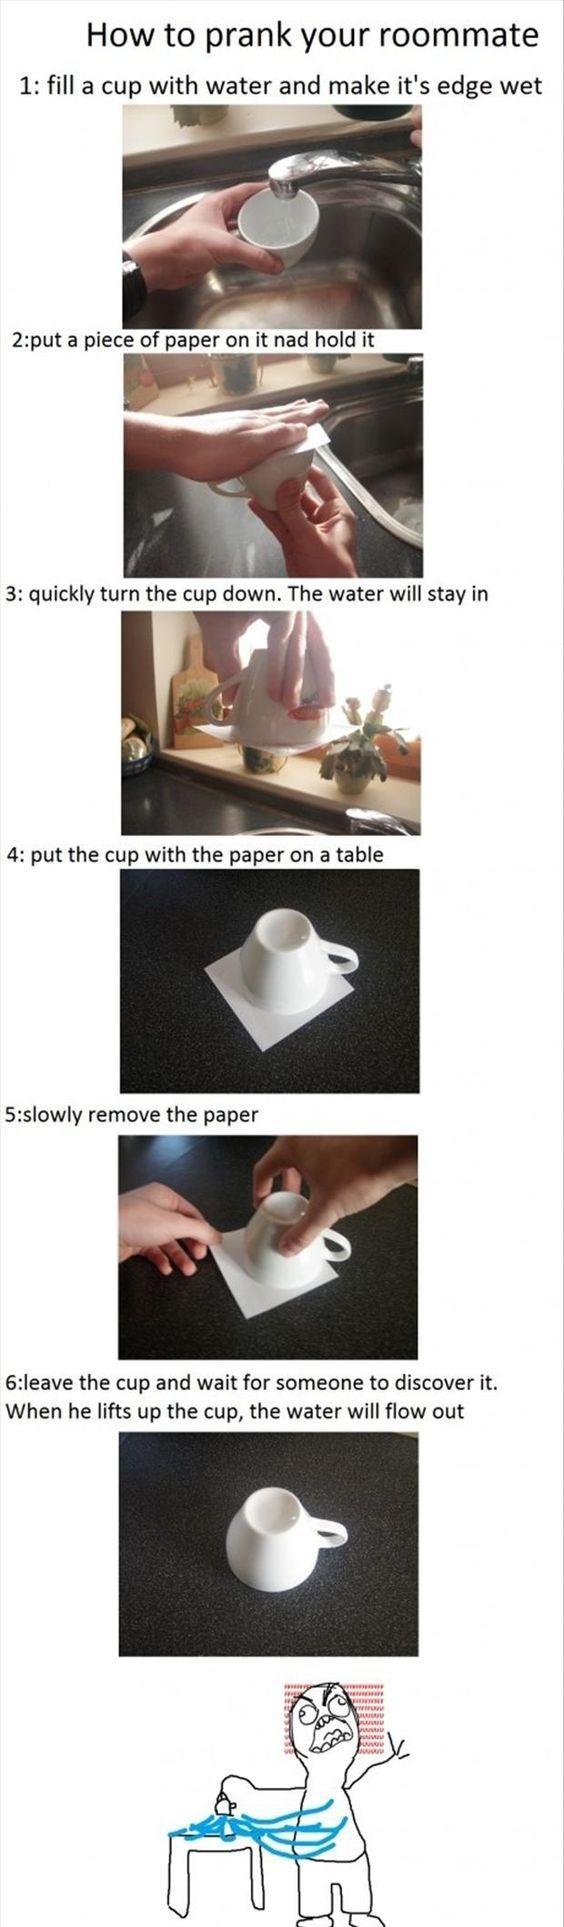 prank ideas                                                                                                                                                                                 More